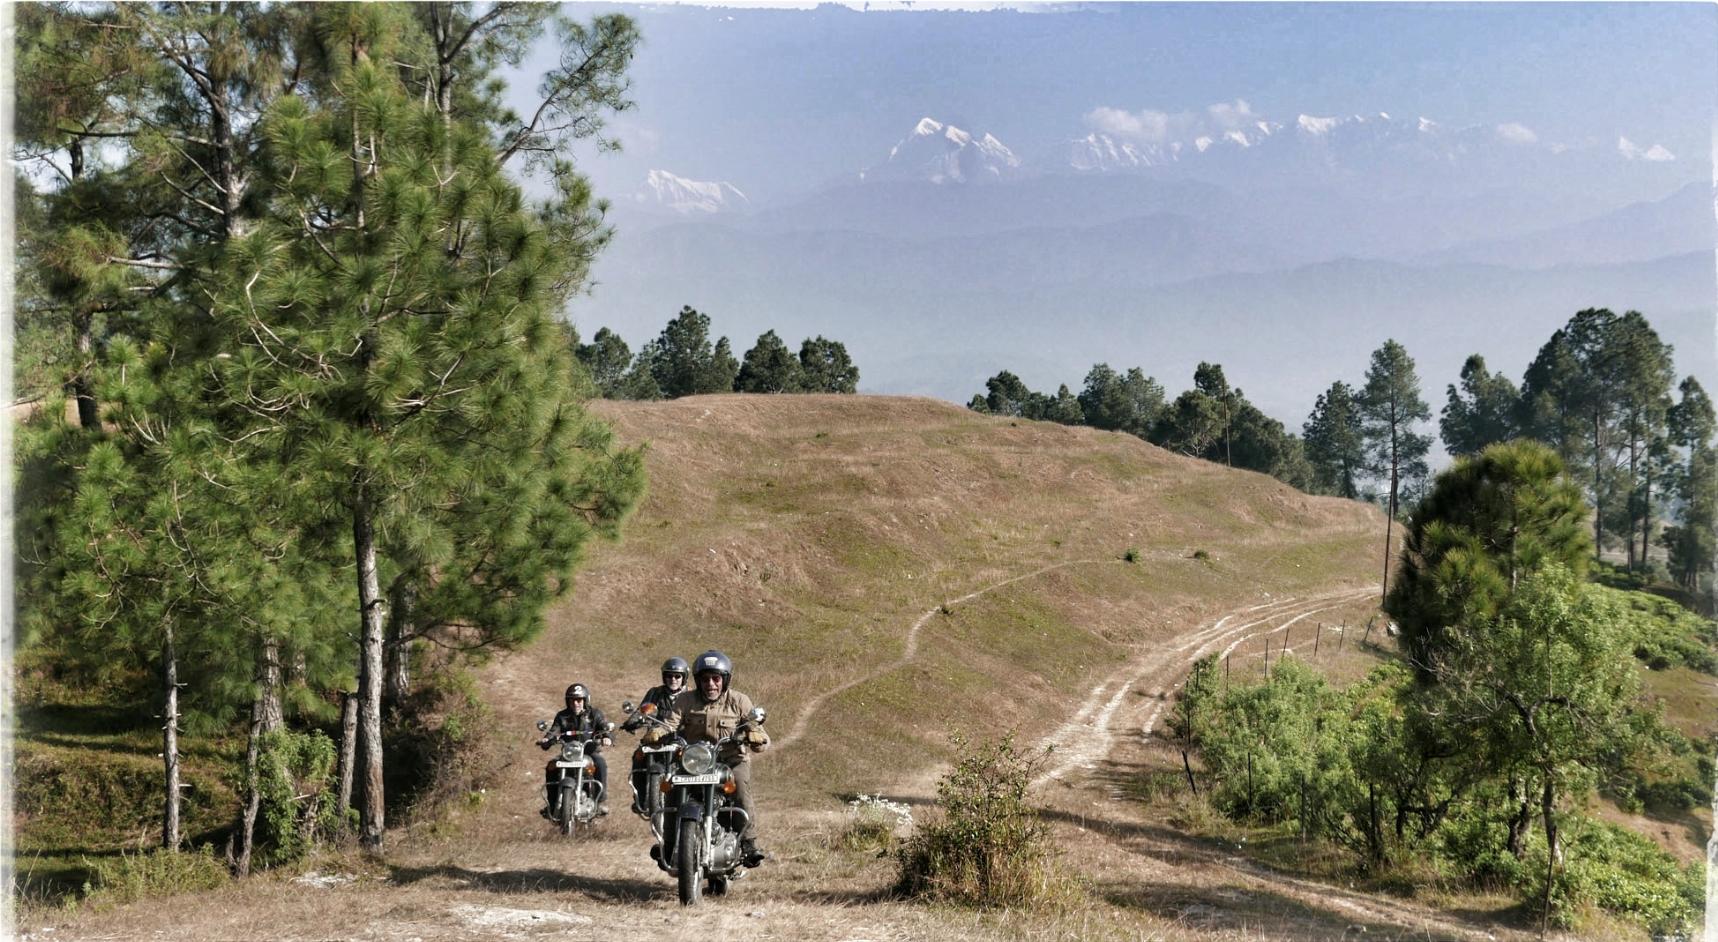 Motorcycle road trip India / Himalaya - Luxury Tour in Uttarakhand